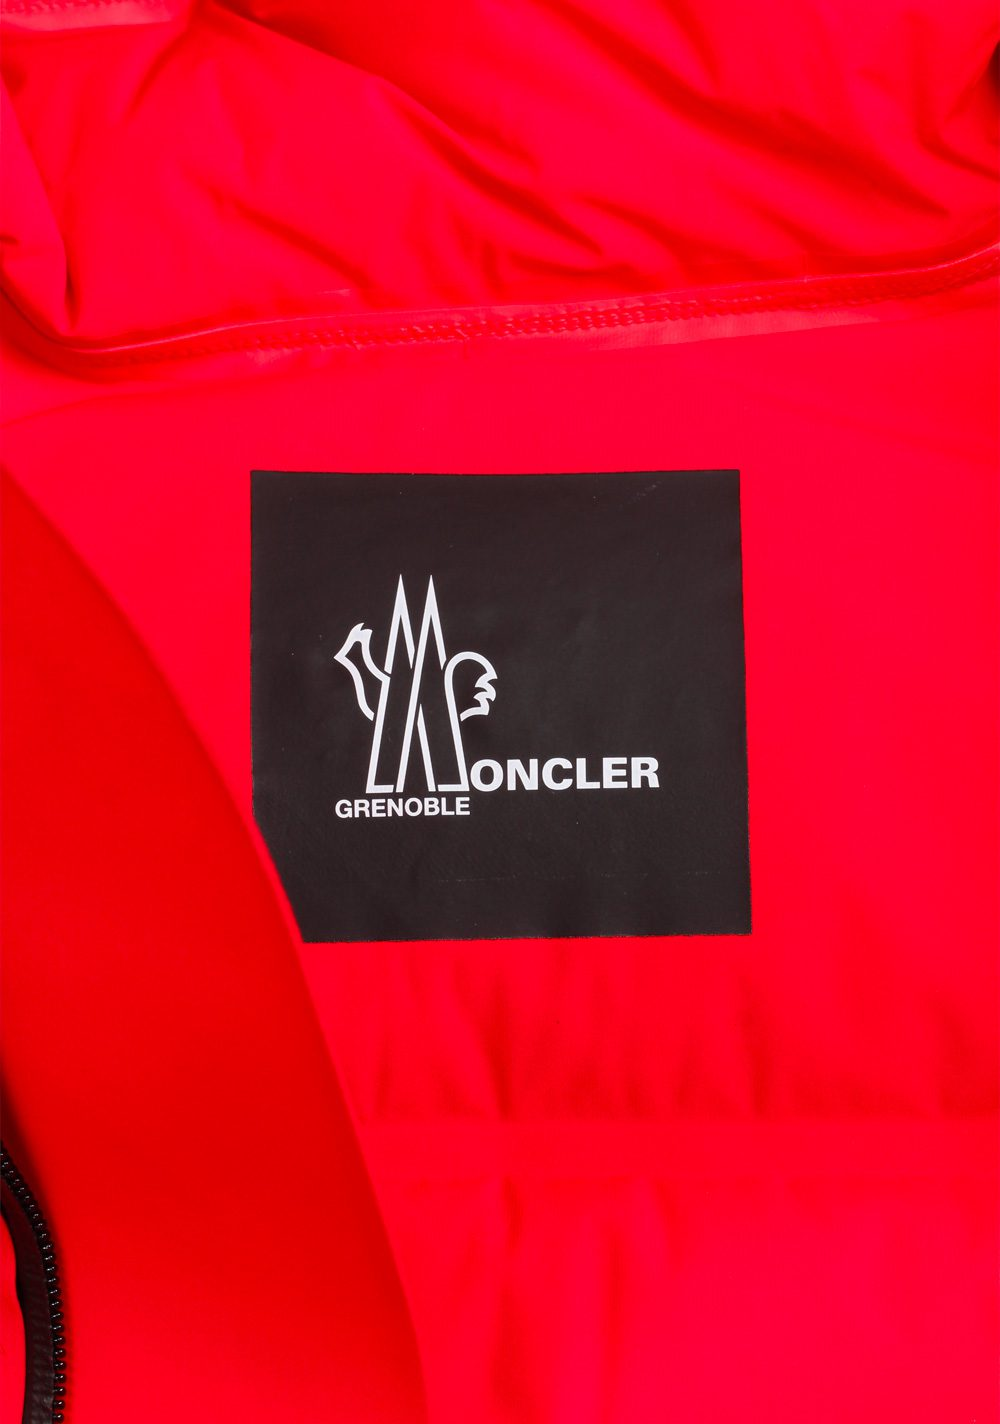 Moncler Red Grenoble Lagorai May Jacket Coat Size 2 / M / 48 / 38 U.S. | Costume Limité